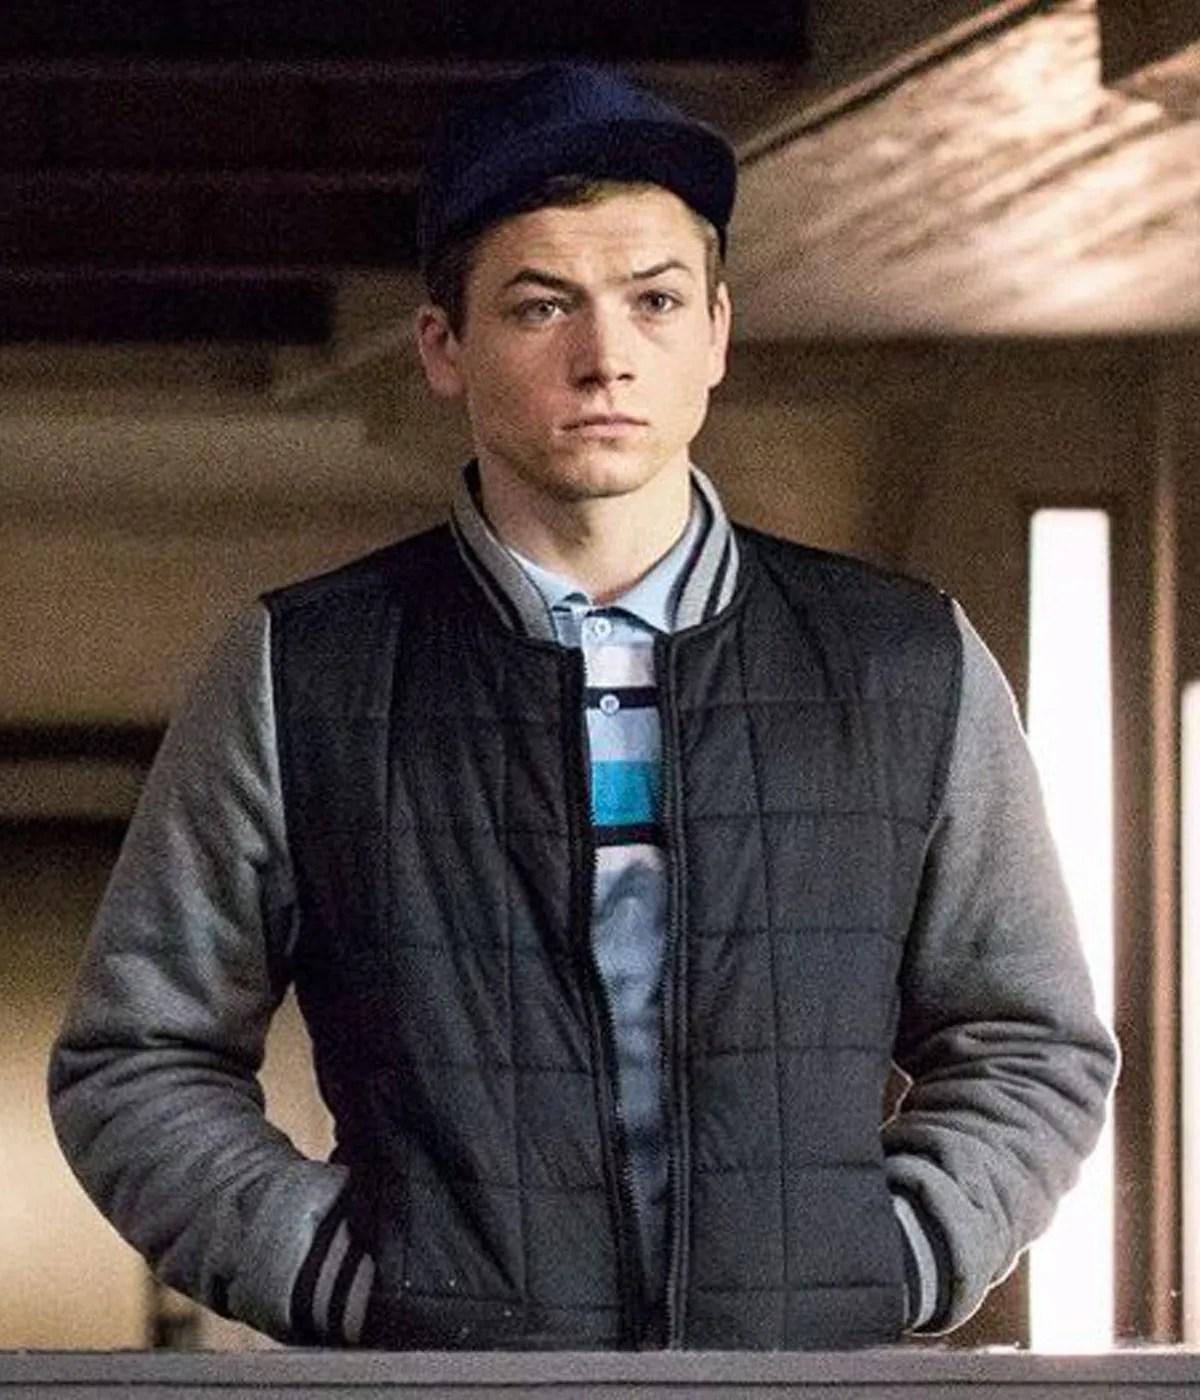 eggsy-unwin-kingsman-the-secret-service-jacket